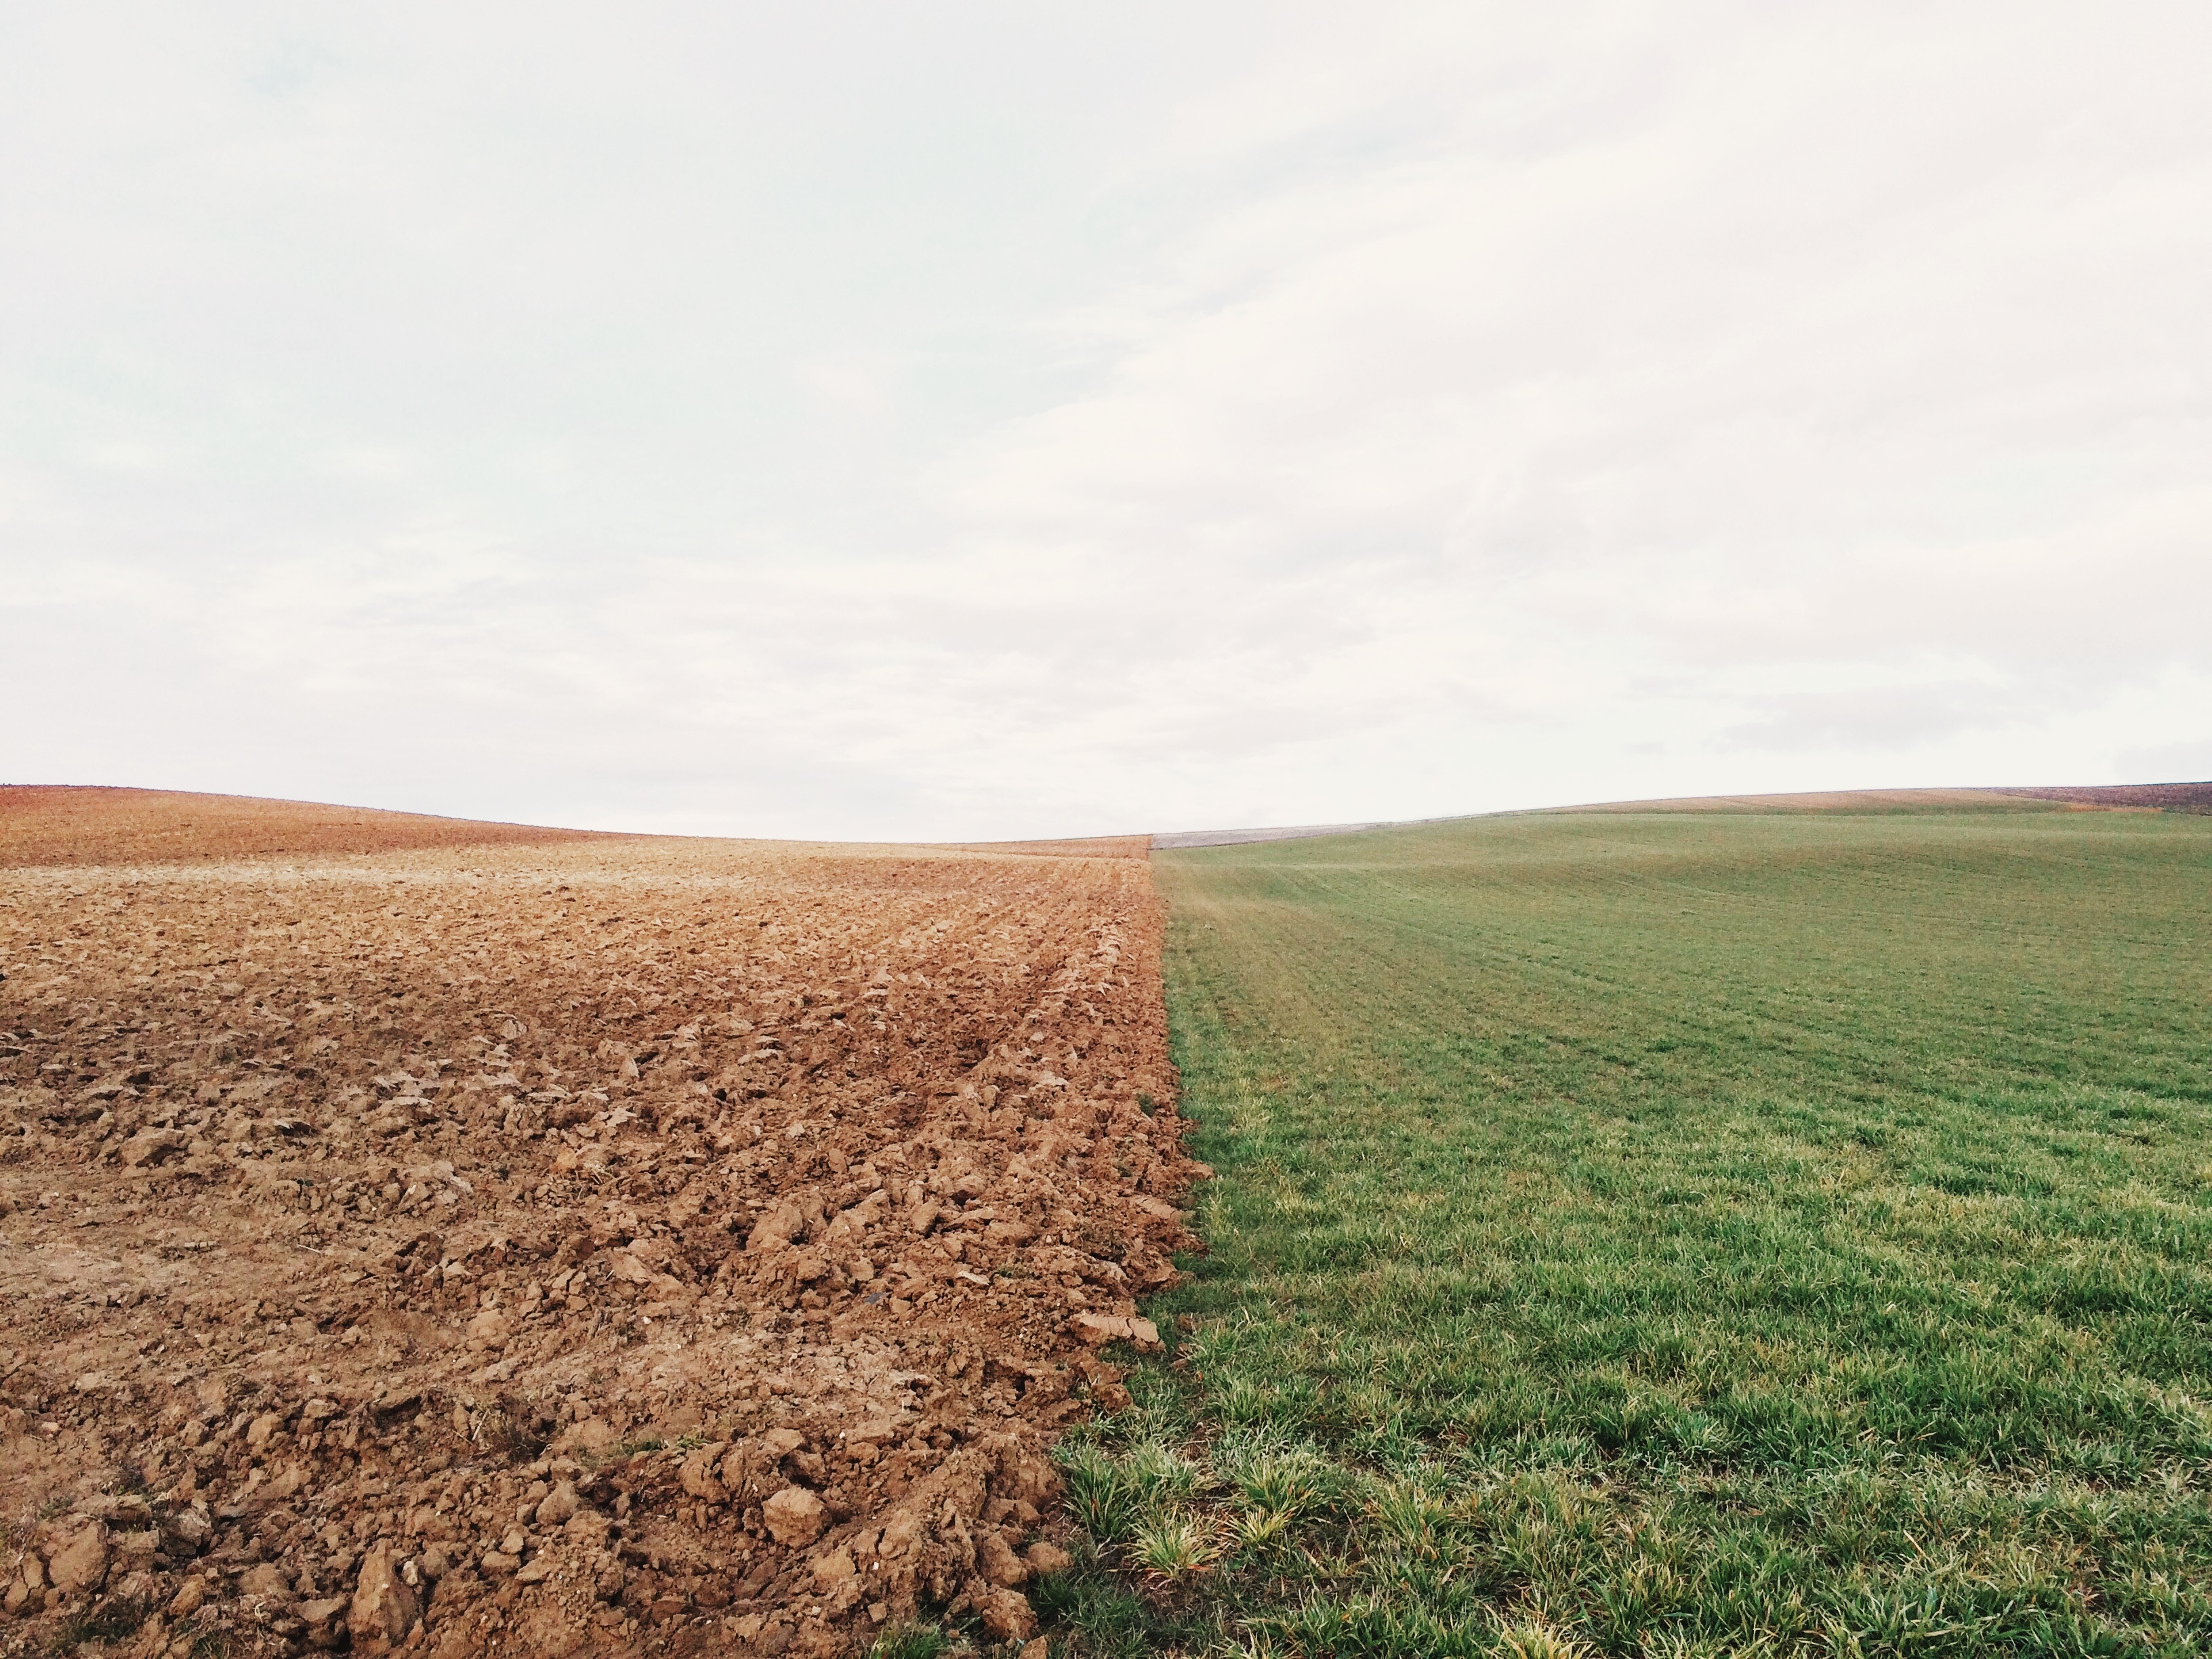 На український ринок вийшов світовий бренд high-tech землеробства